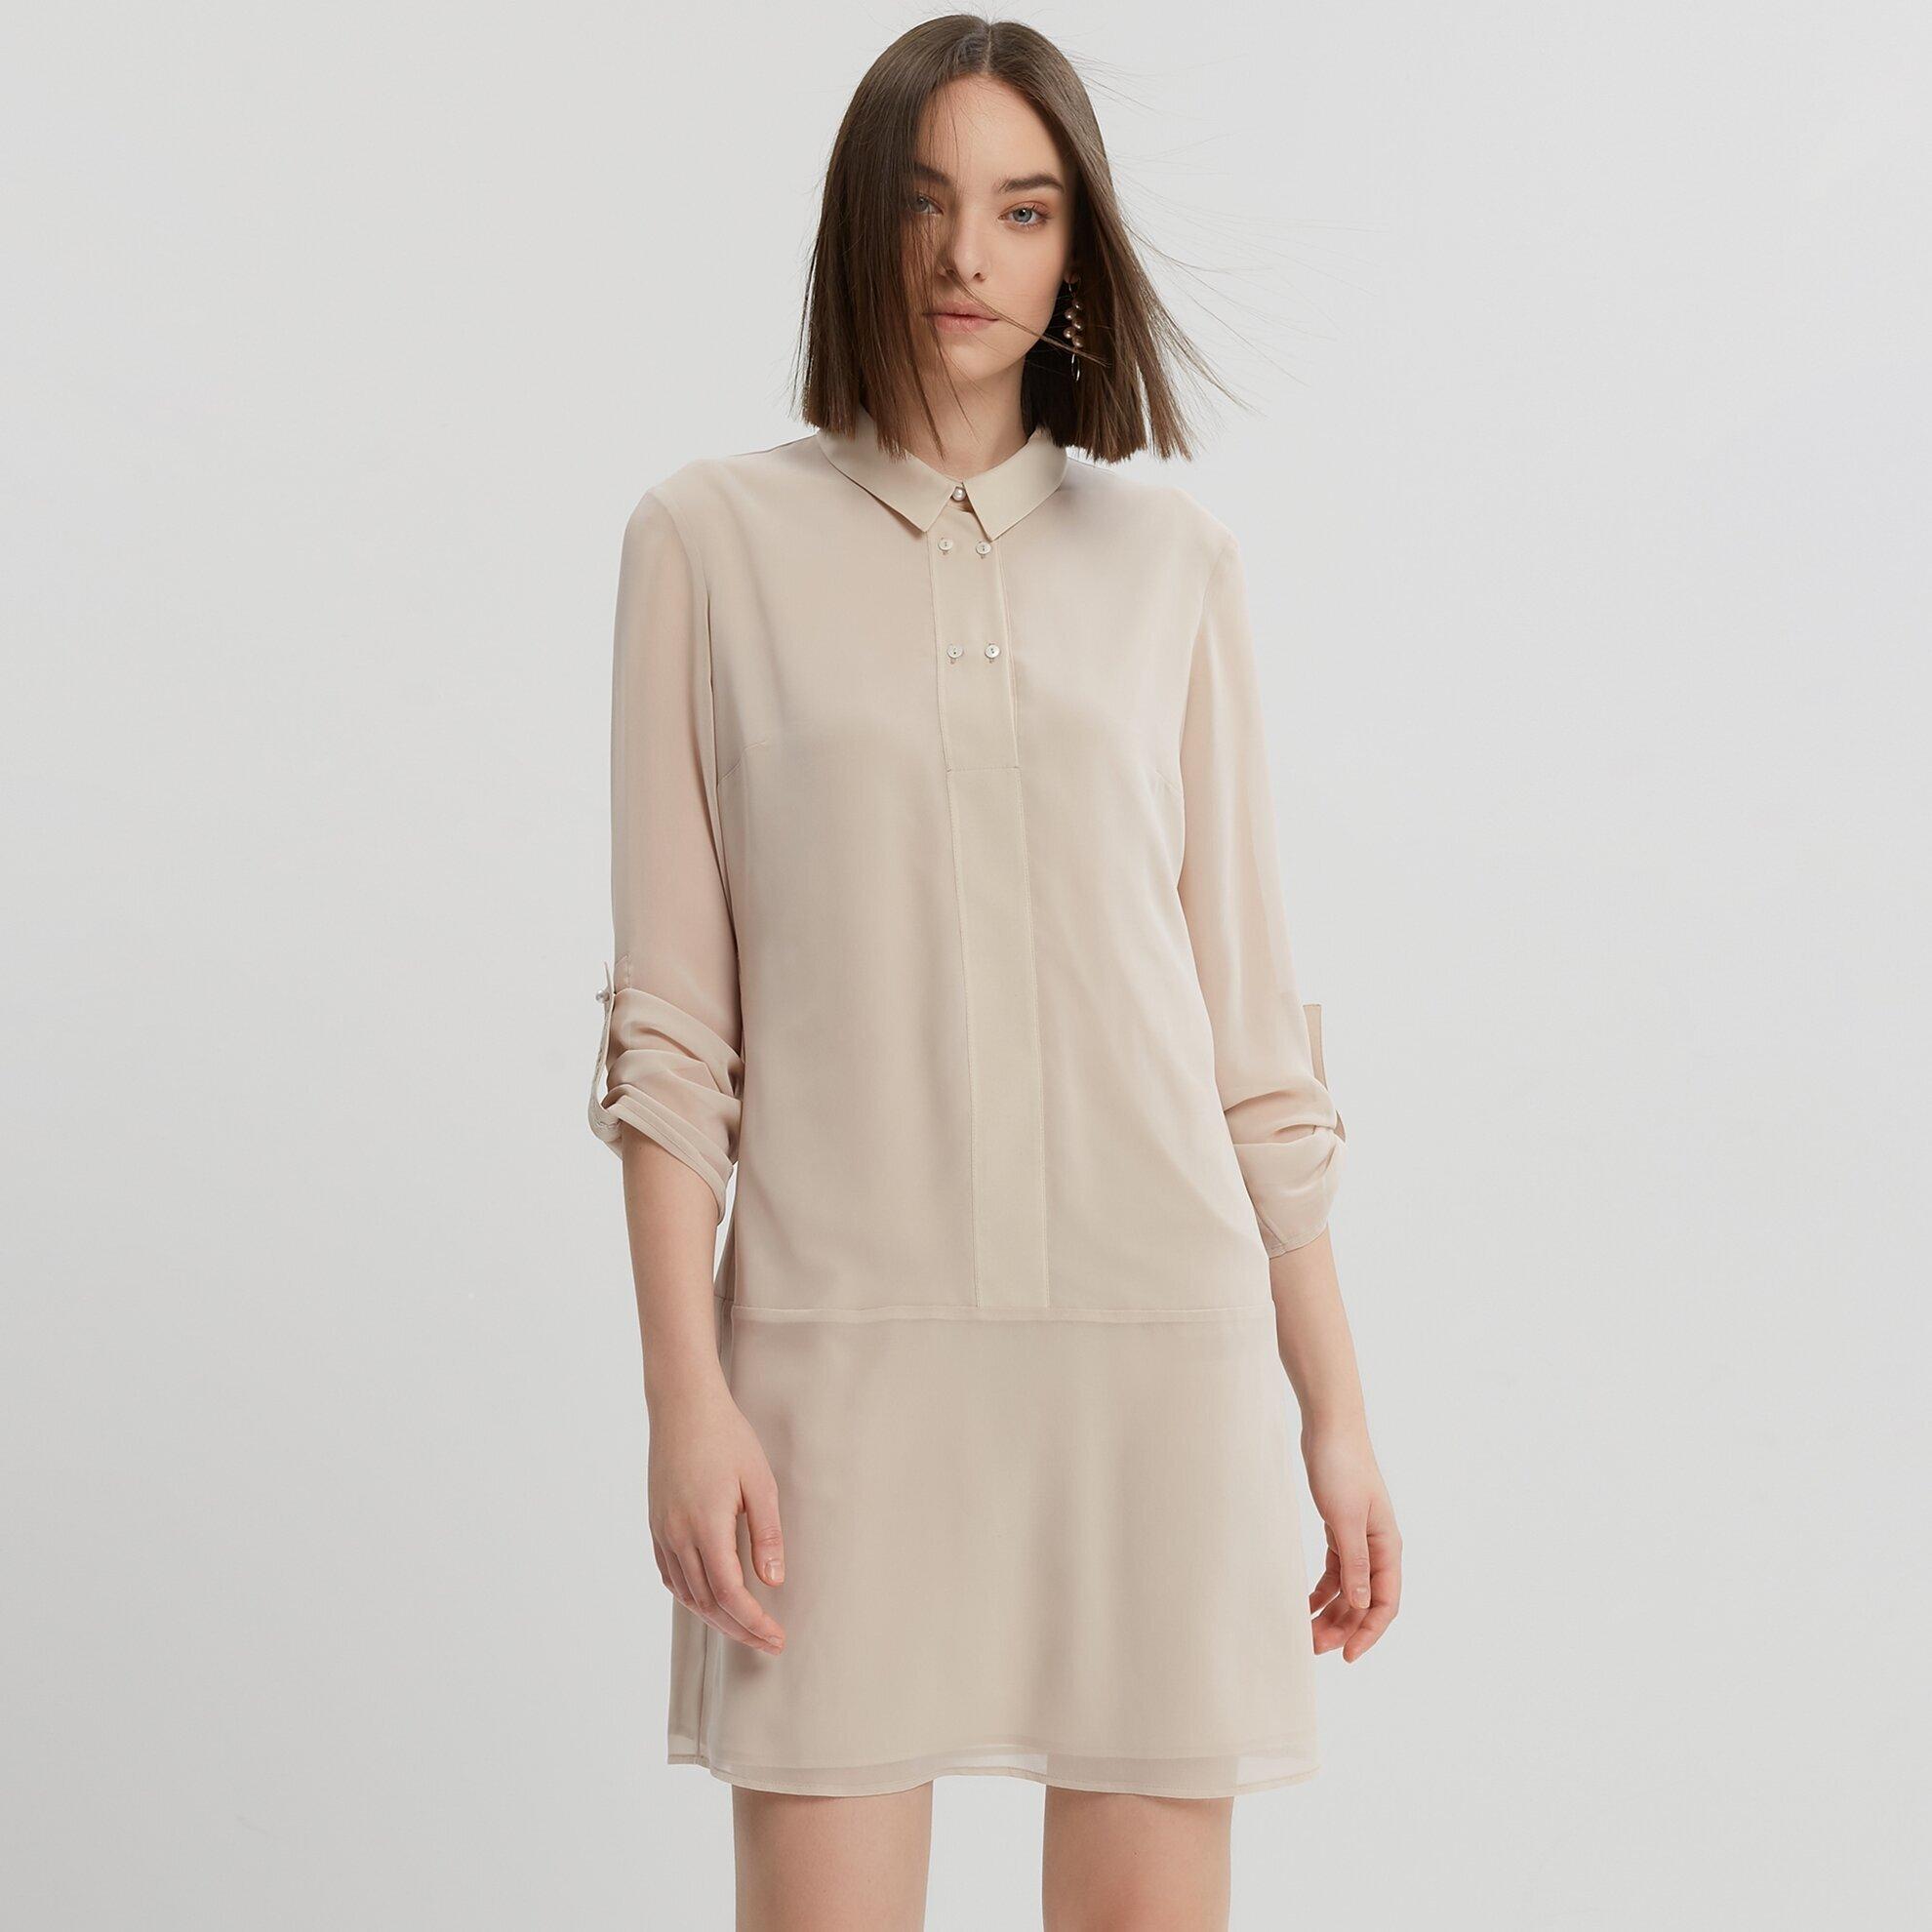 Apolet Detaylı Elbise